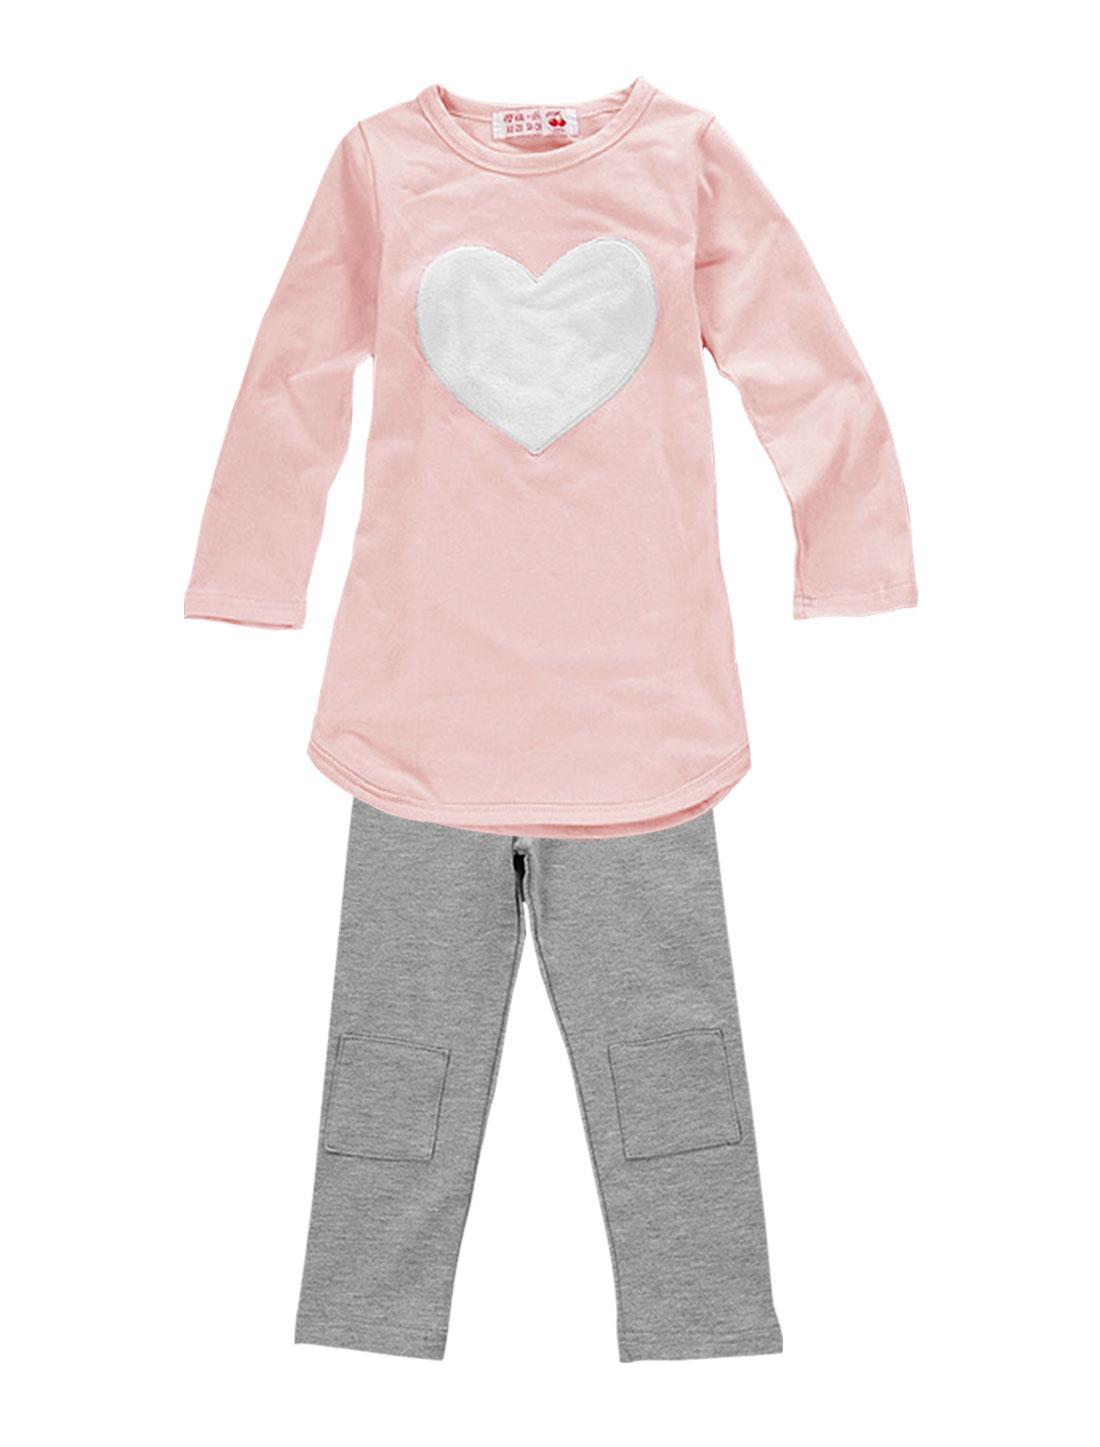 Girls Heart Shape Panel Top w Elastic Waist Pants Sets Pink Gray 5